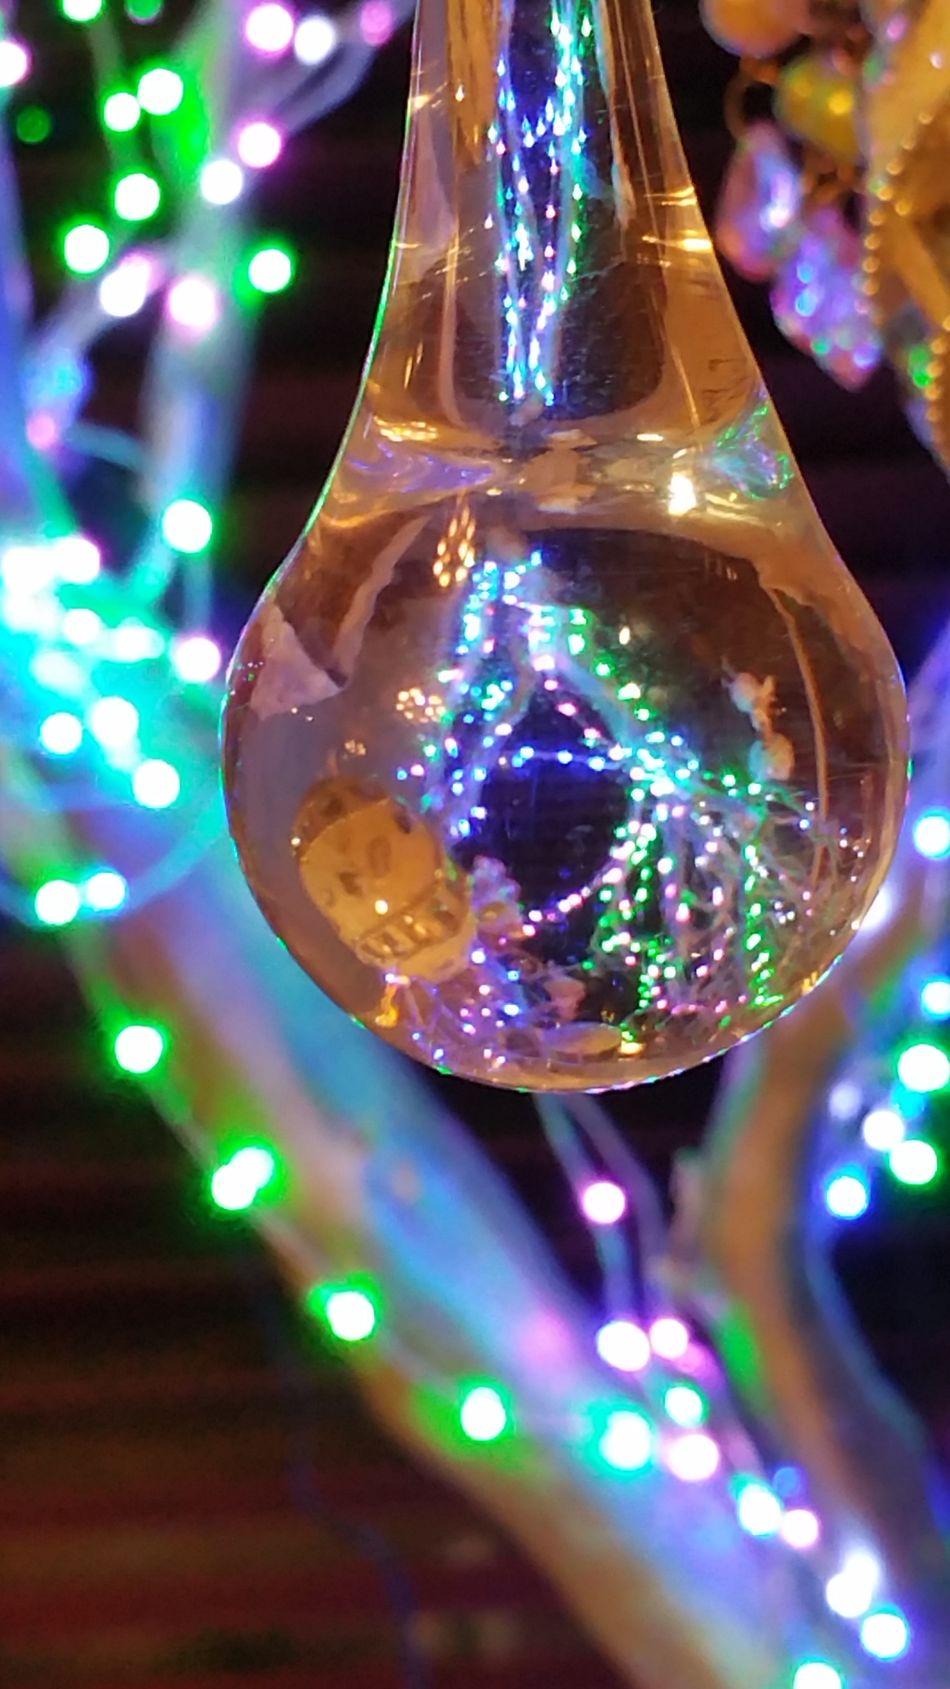 Christmas Light Dance First Eyeem Photo